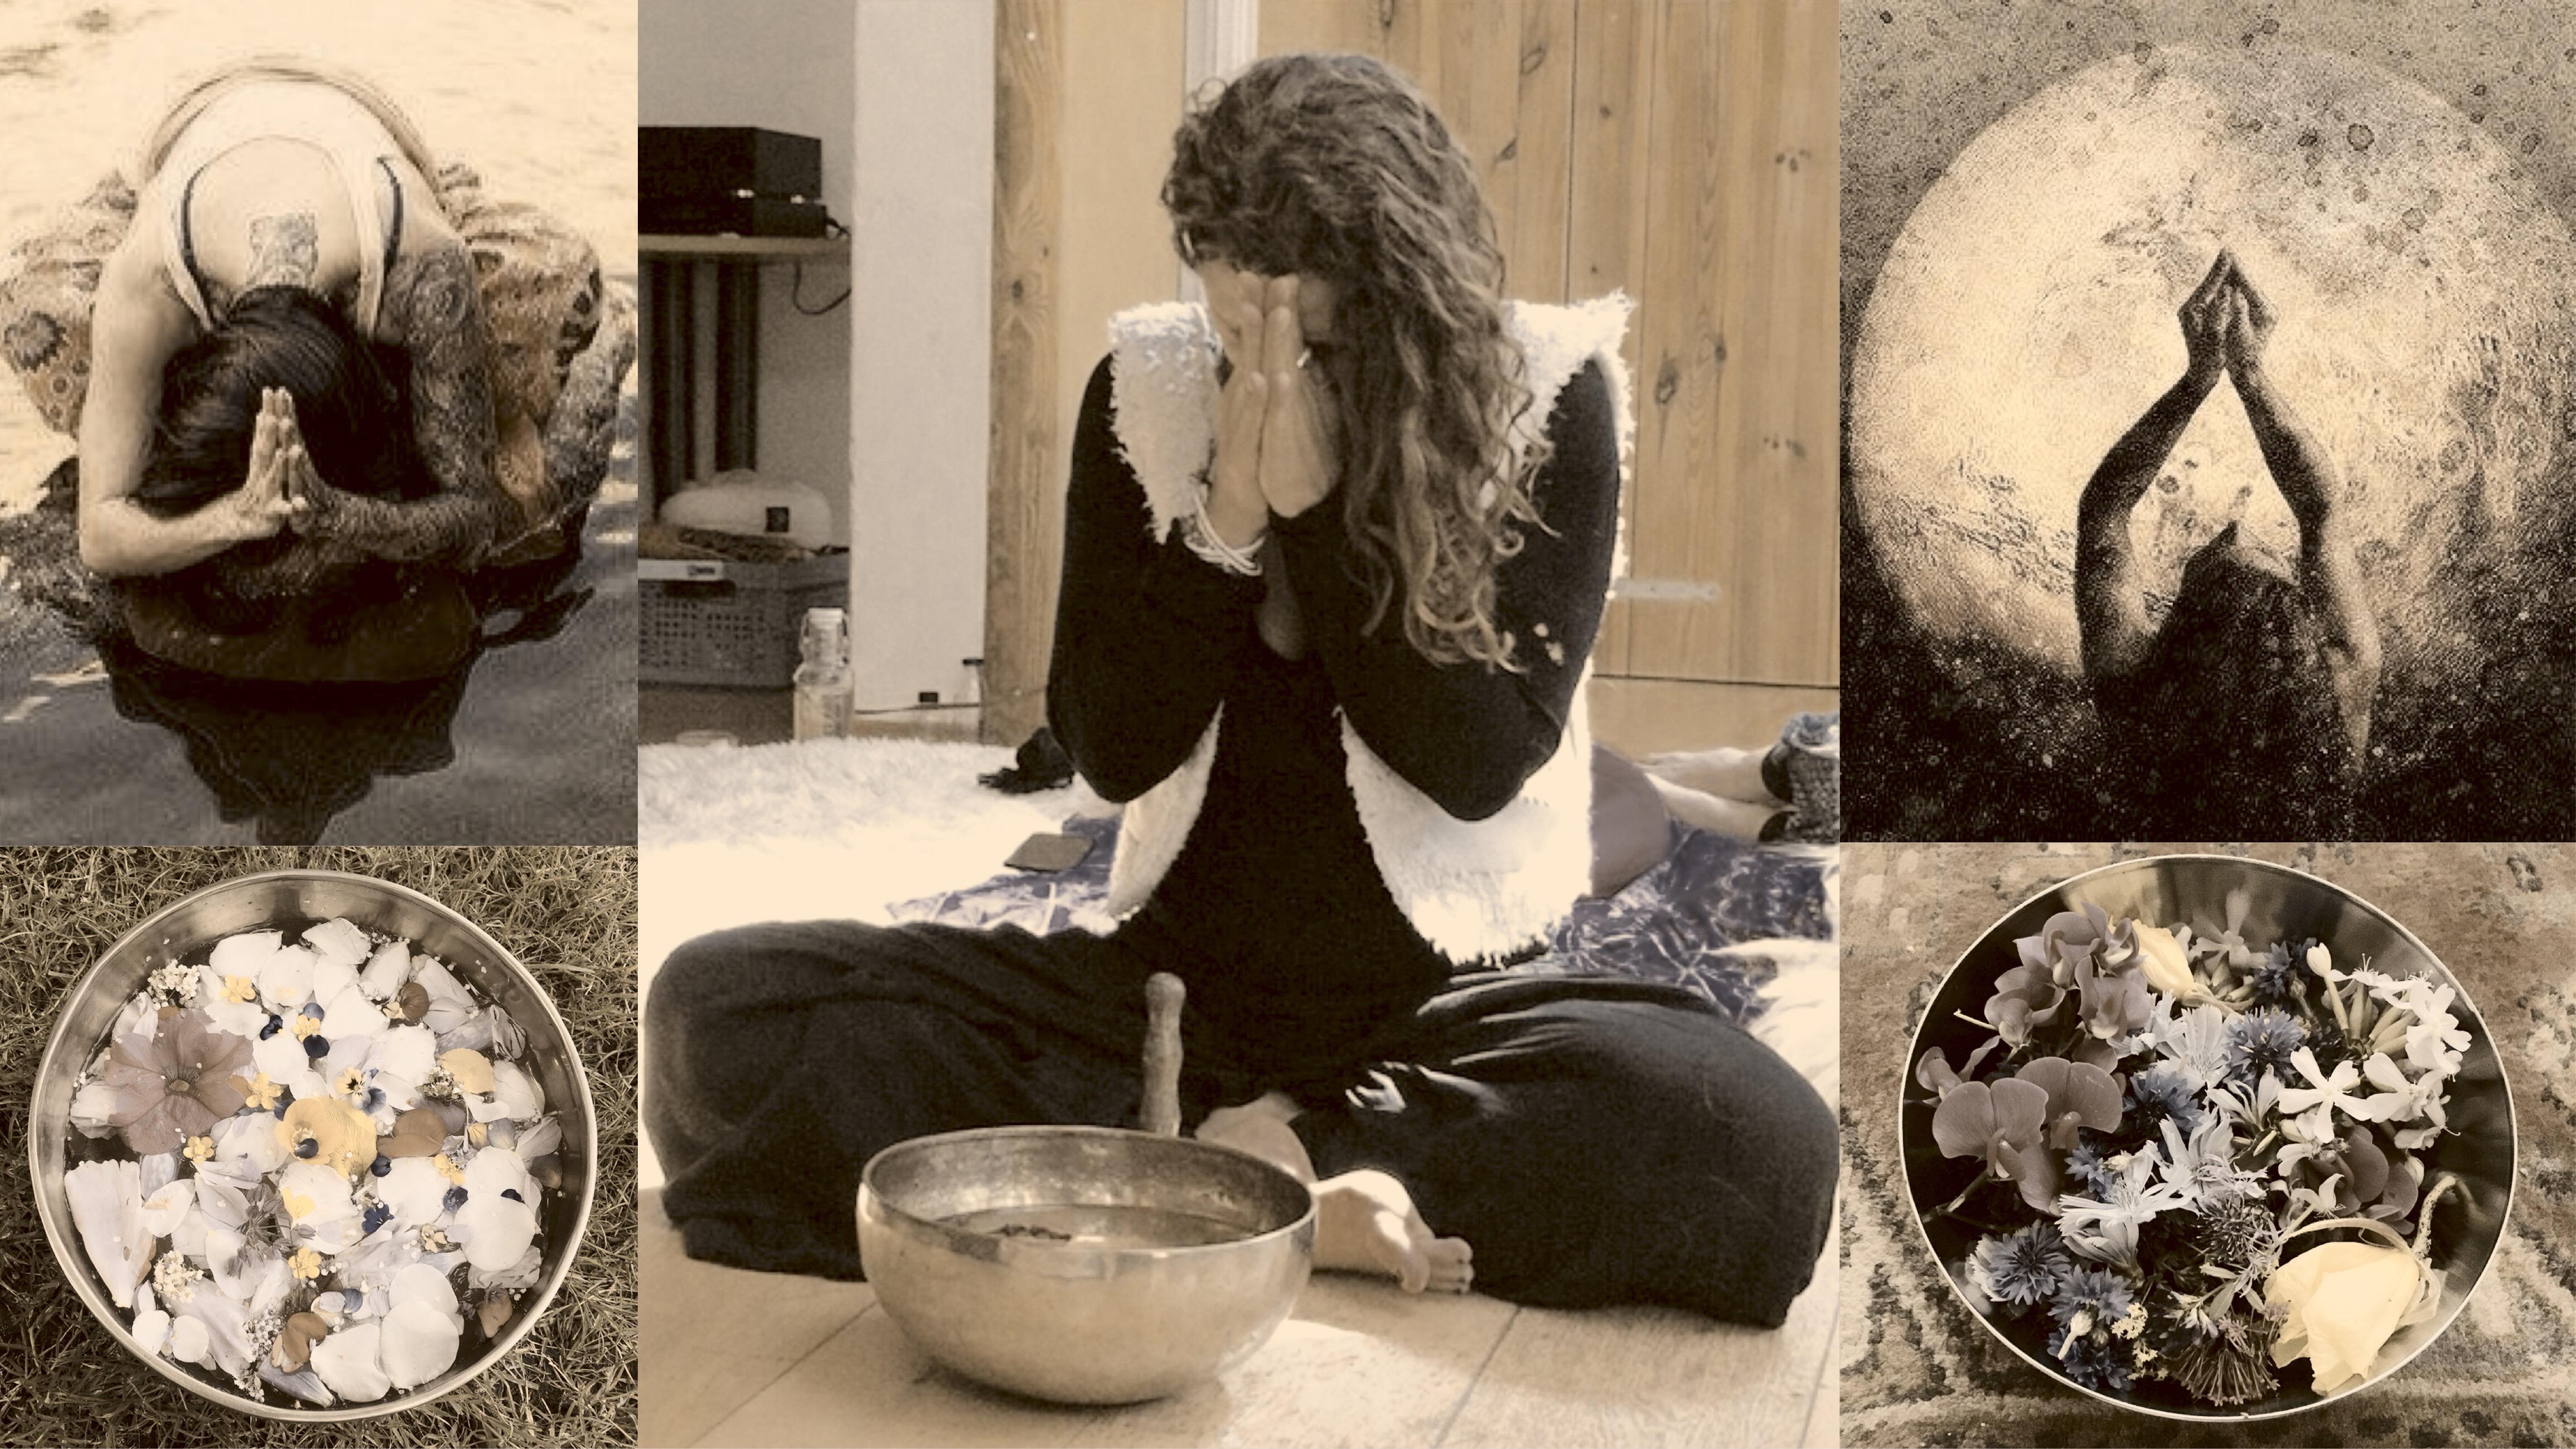 Water Prayer Ritual 1